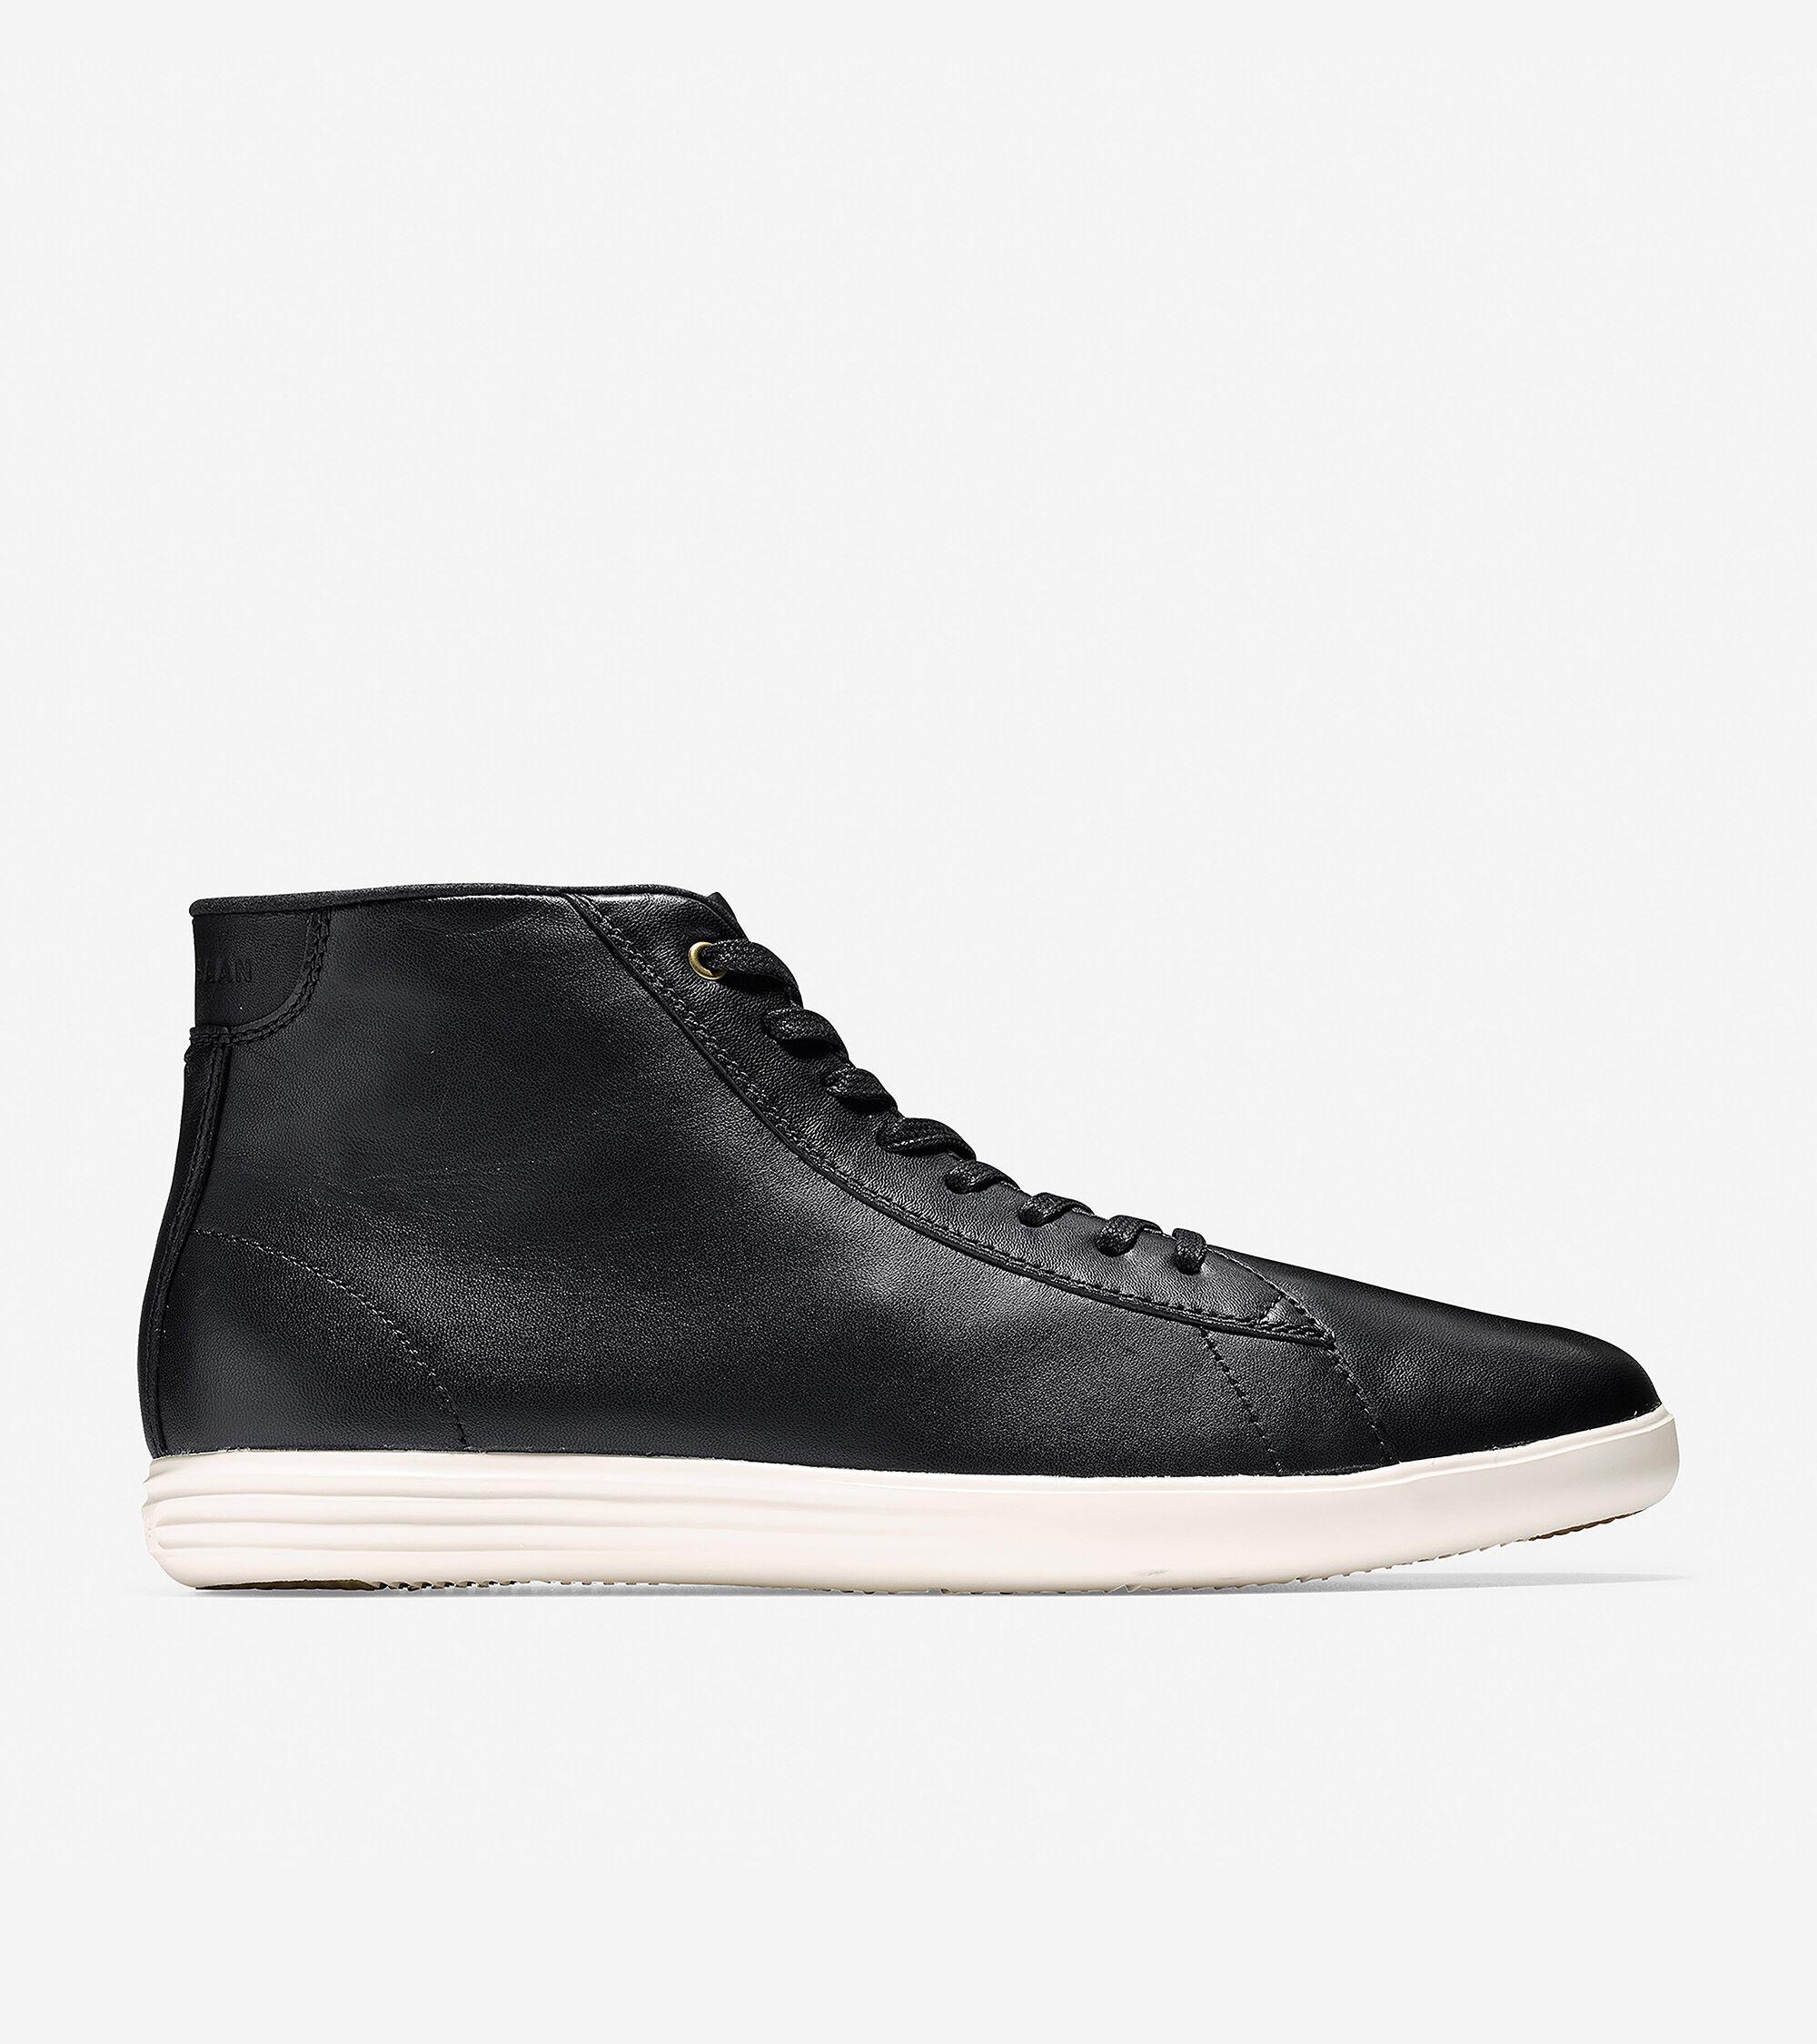 Cole Haan Grand Crosscourt High Top Sneaker